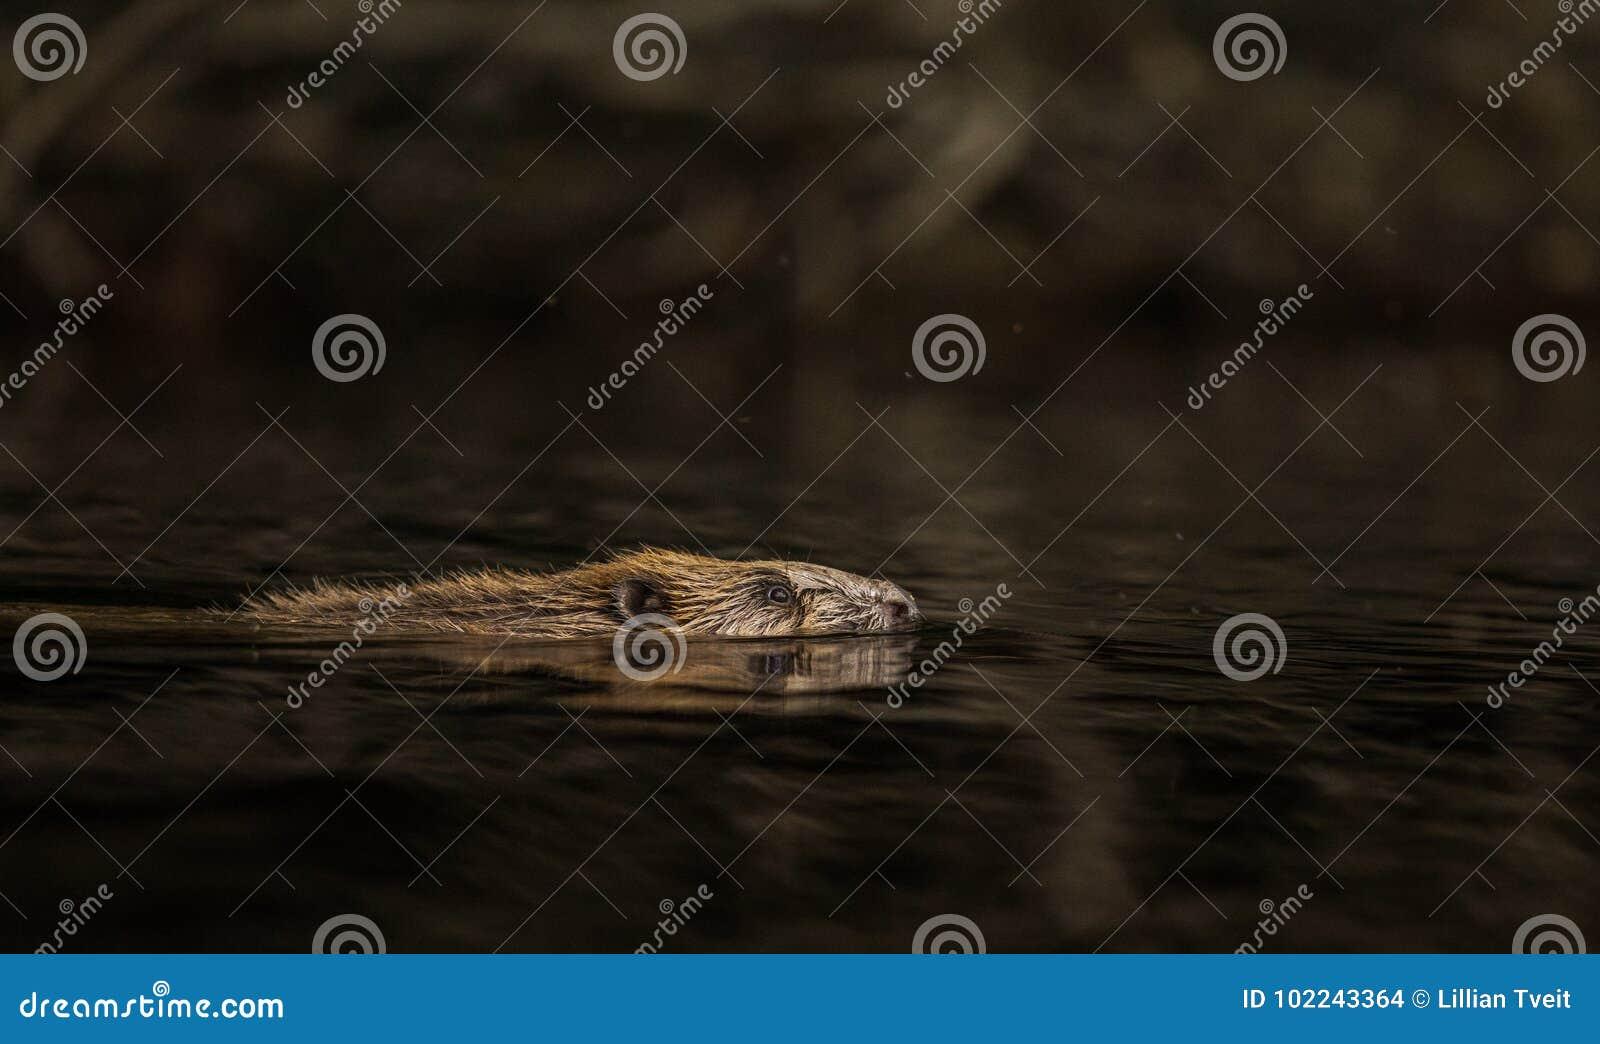 Beaver, Castor Fiber, Swimming In Dark Water Stock Photo